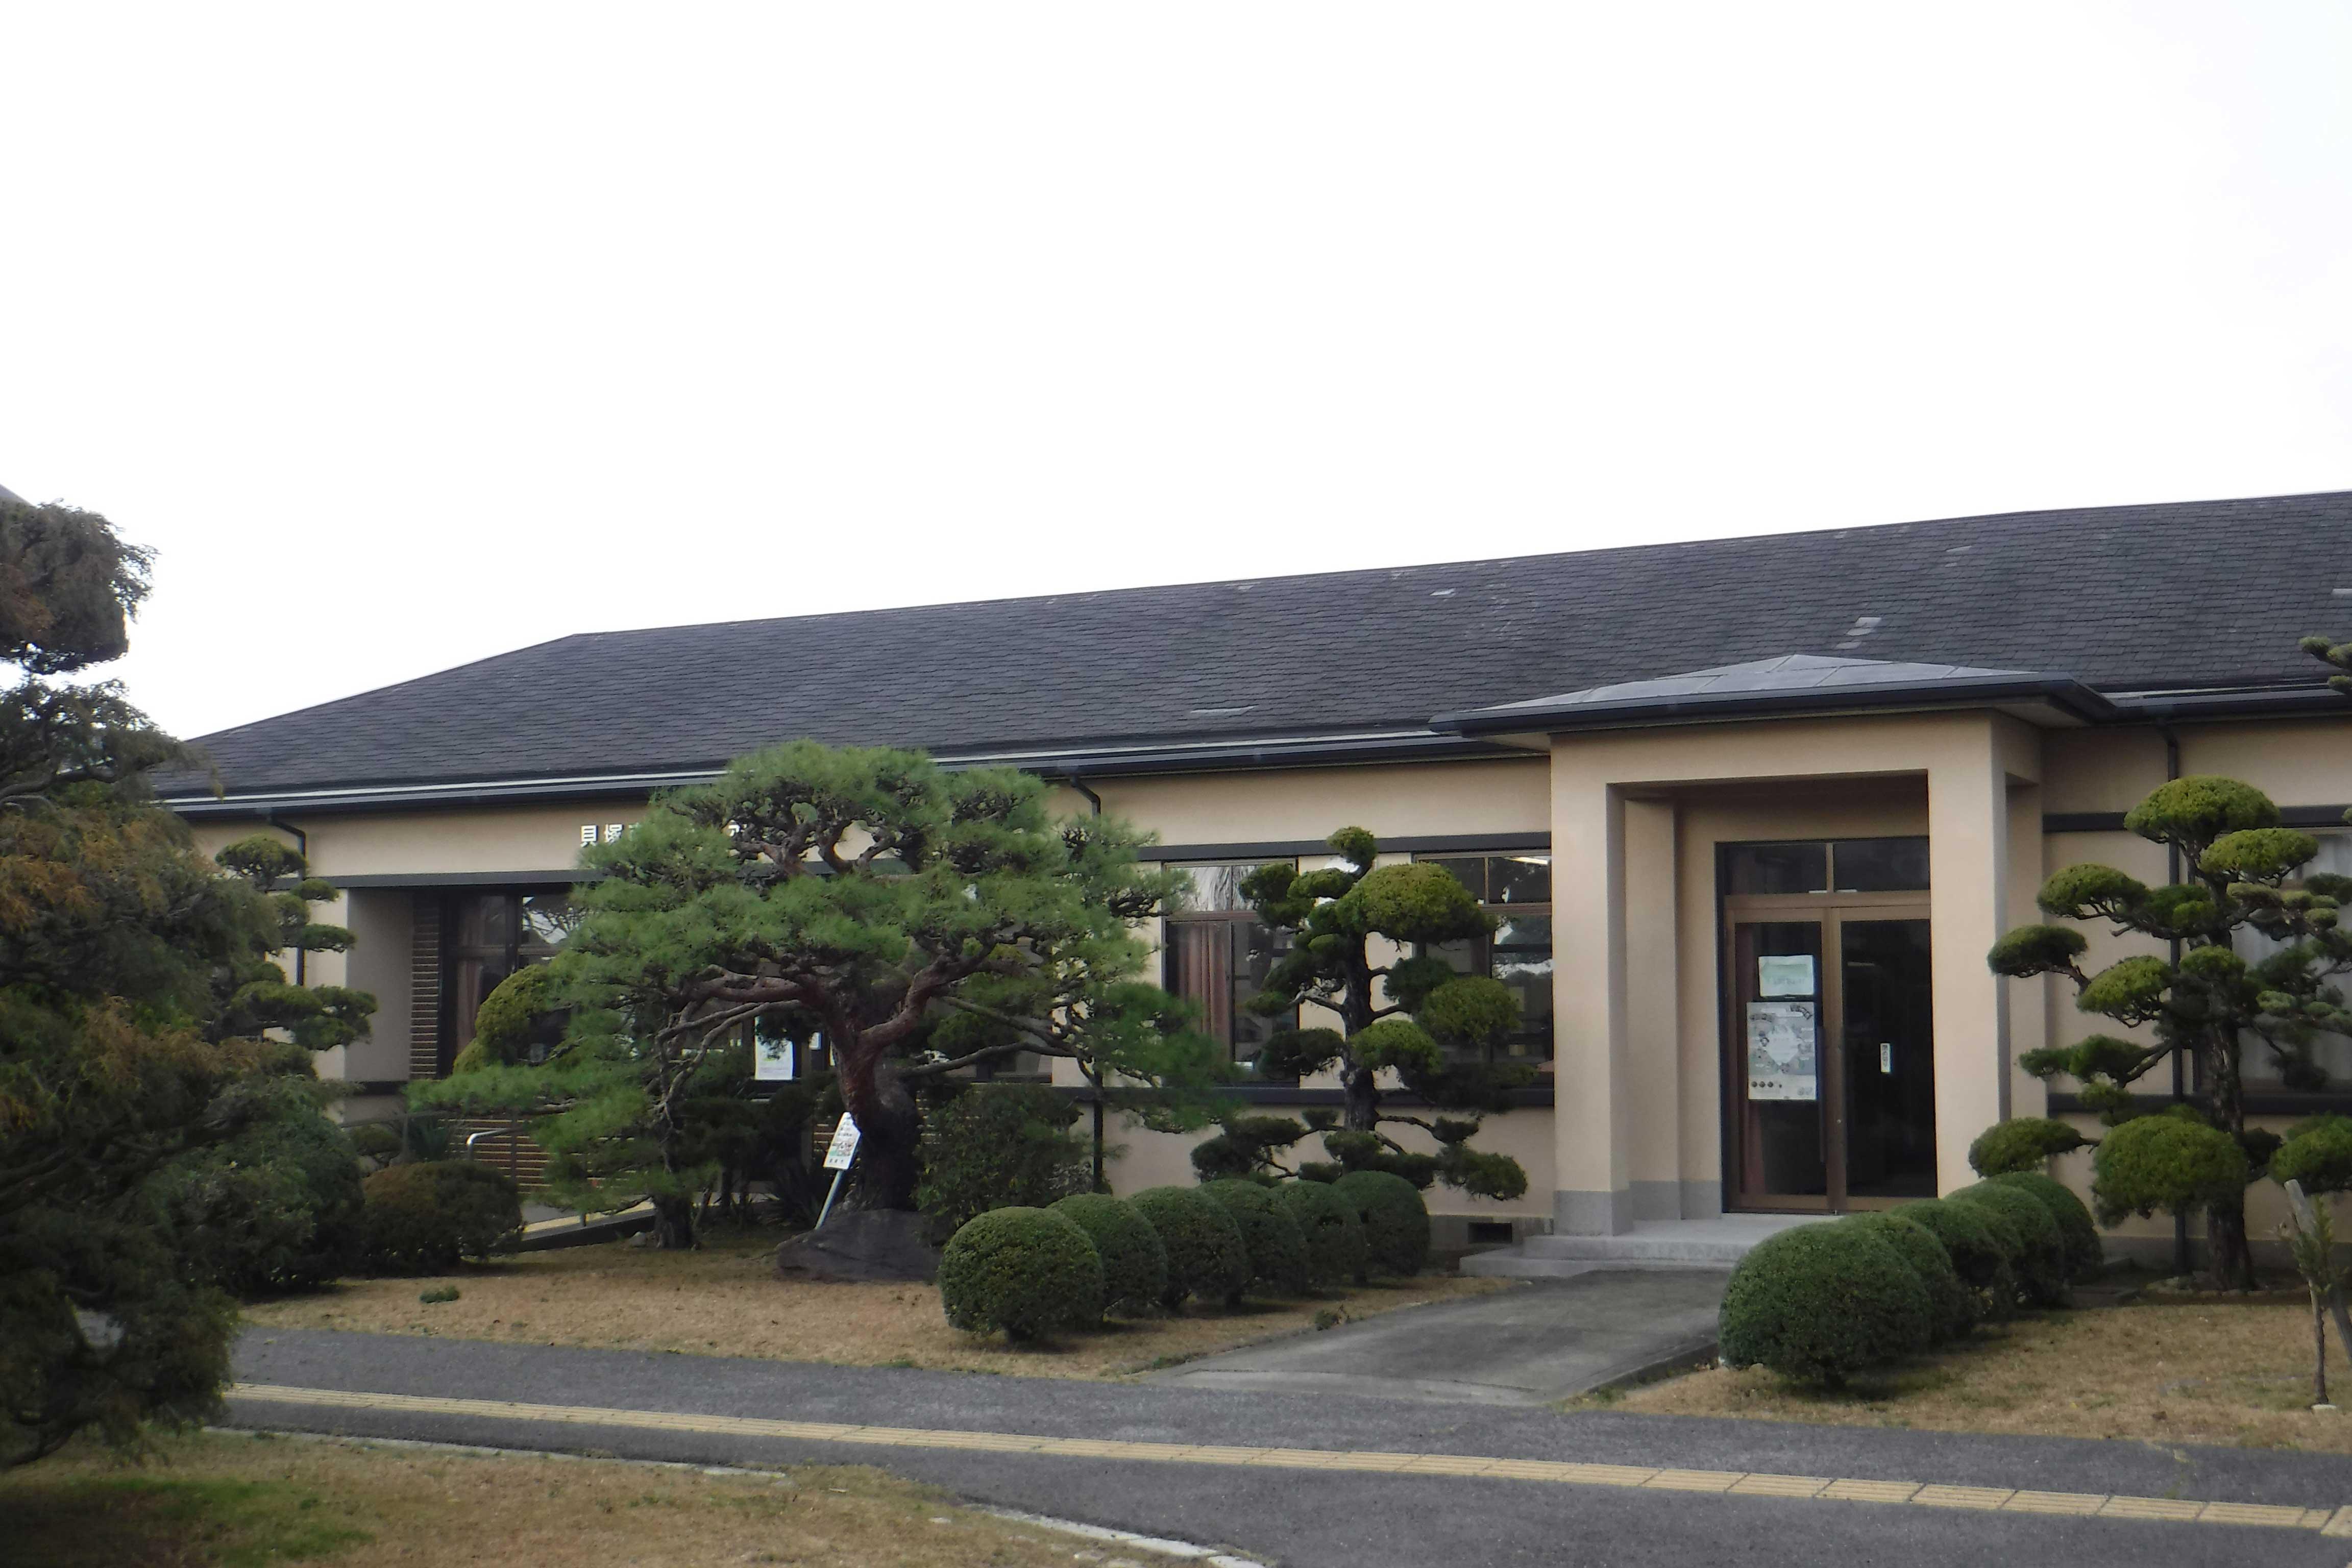 <p>手前増築部</p>突出部から右は昭和天皇の行幸を予定して増築された。